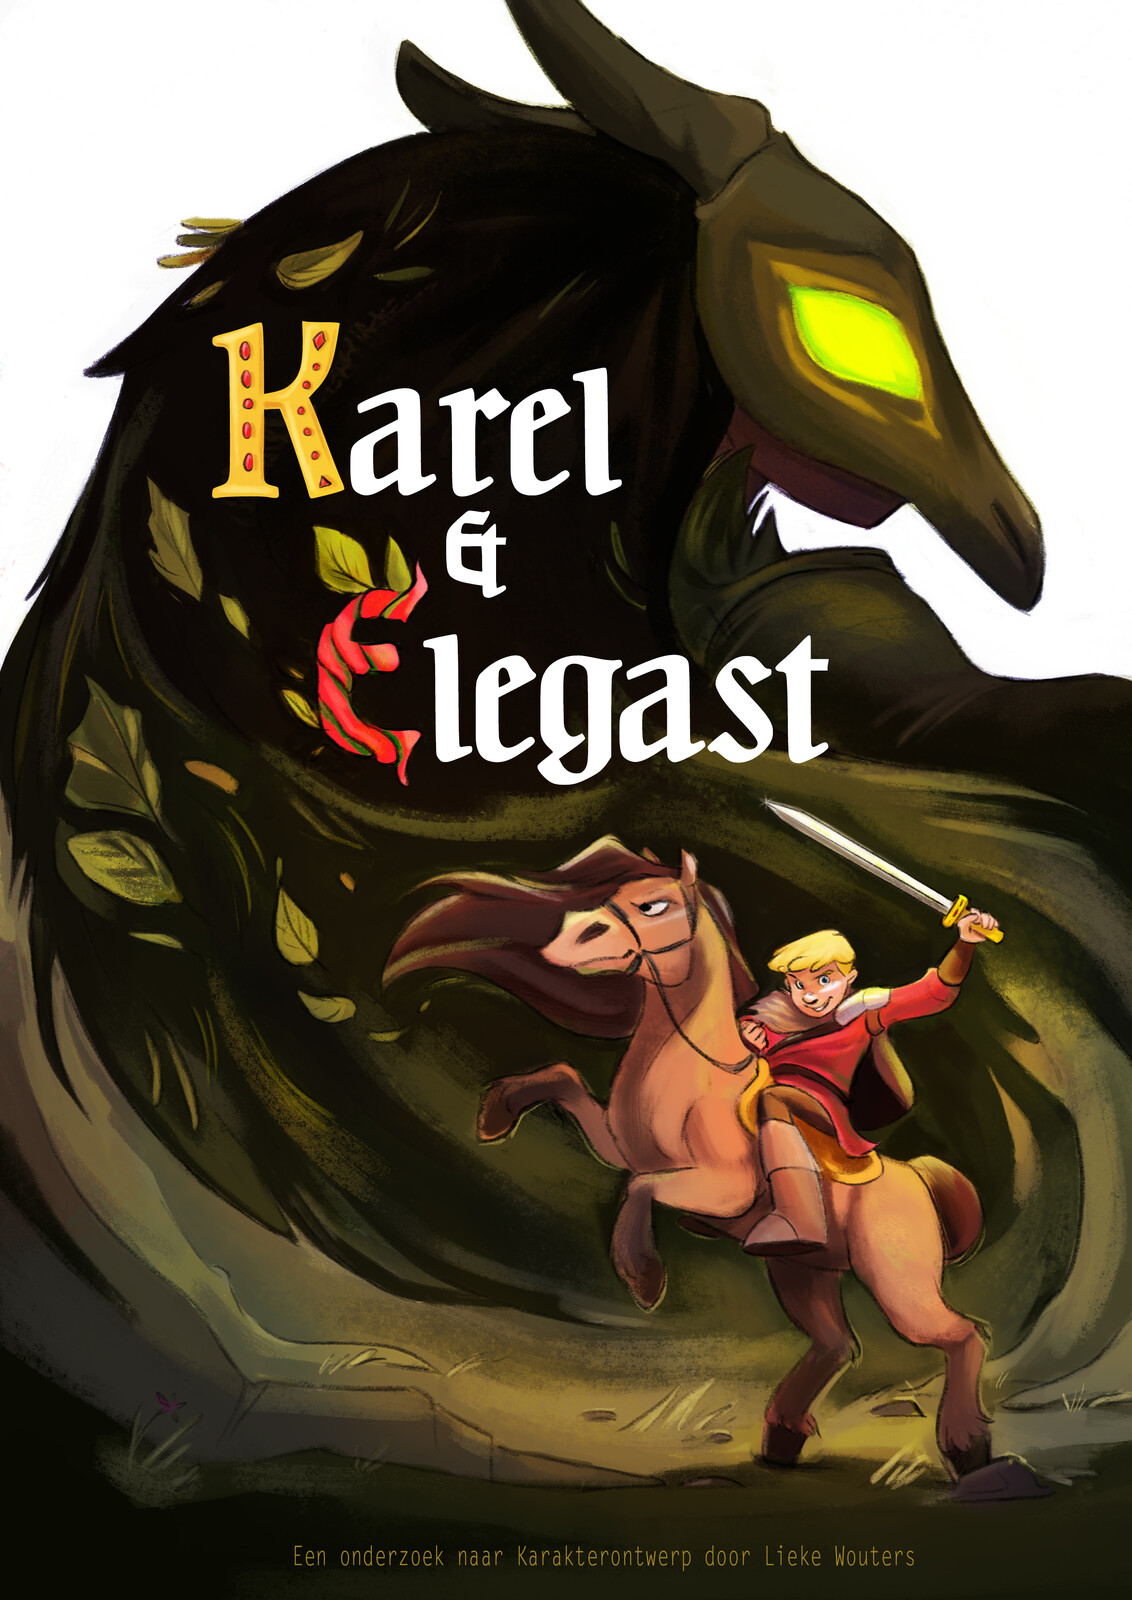 Karel & Elegast Project Poster - Character Development - Expo